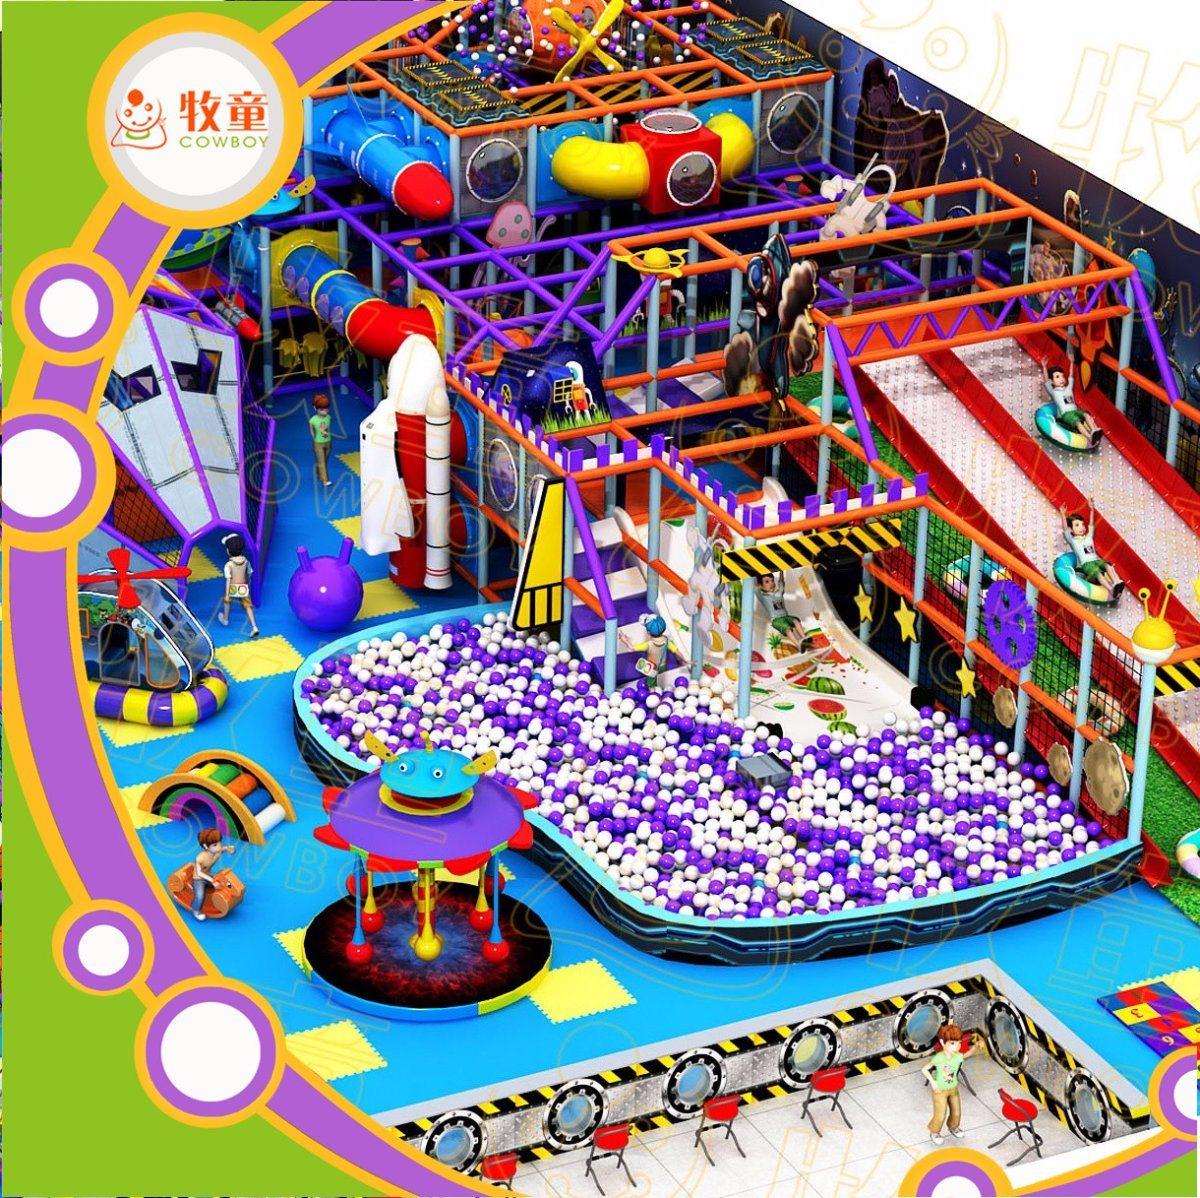 Kids Zone New Design Guangzhou China Cowboy Toys Factory Soft Indoor Playground